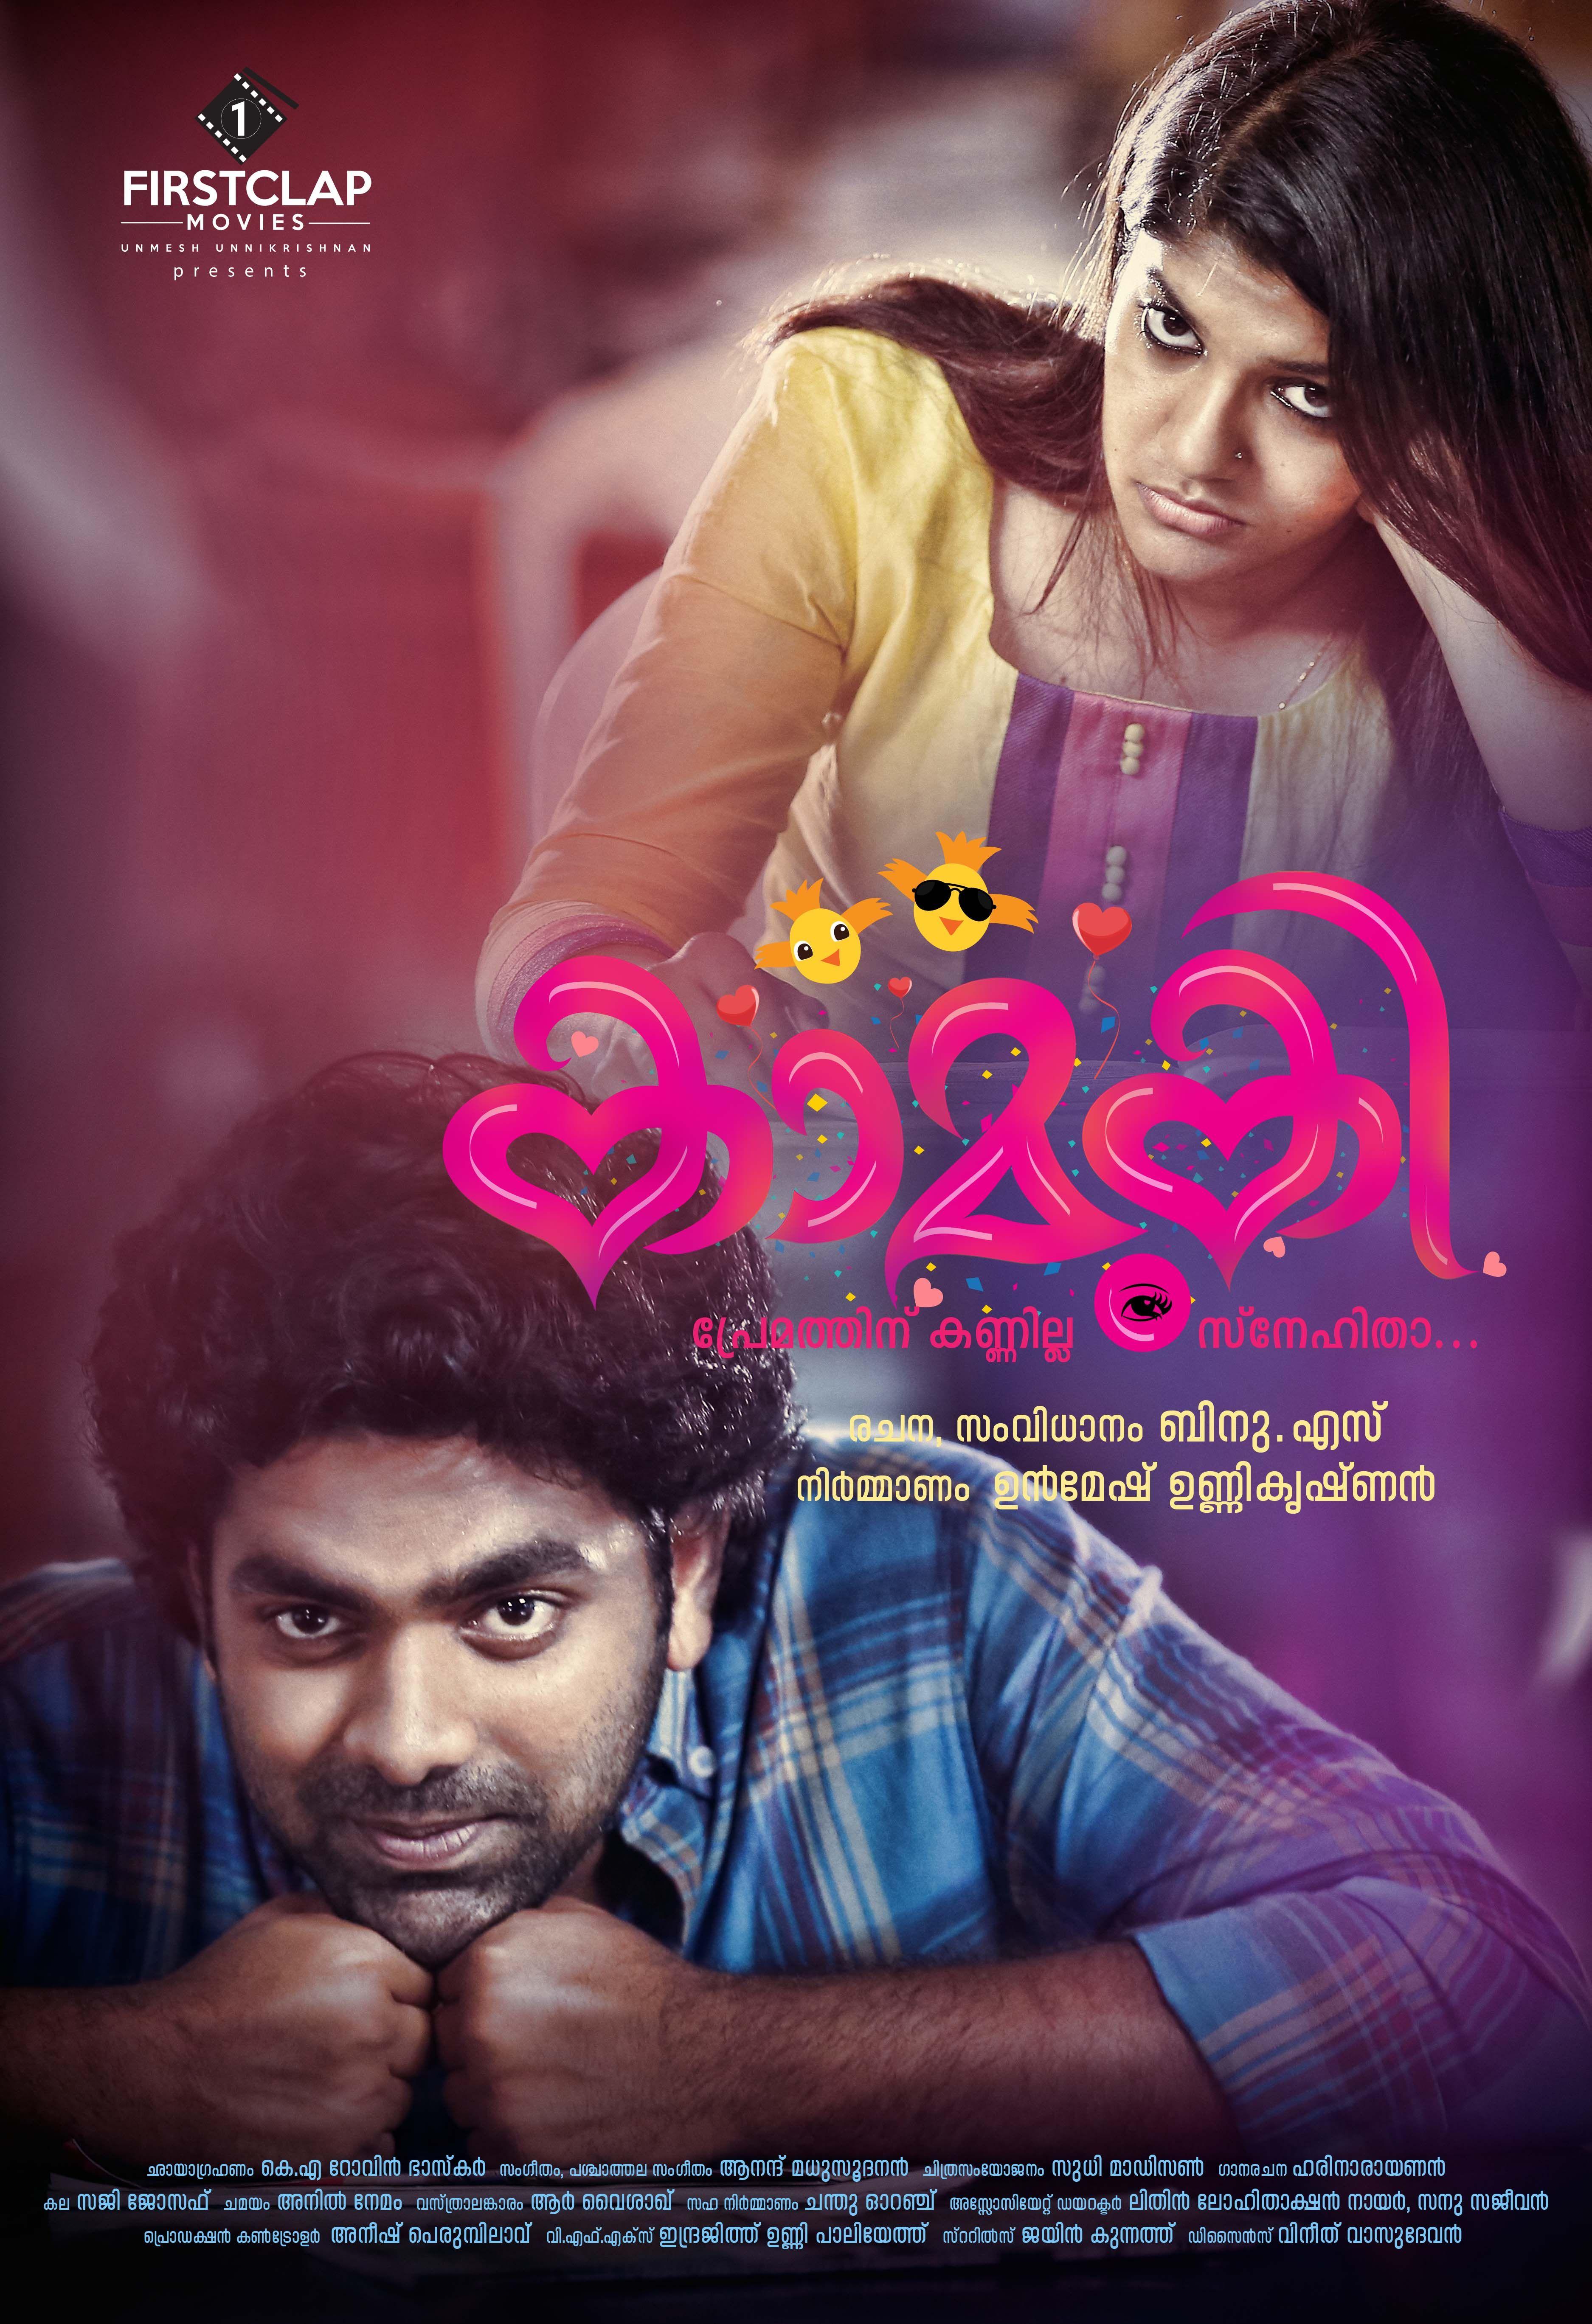 Pin By Vineeth Vasudevan On Kaamuki Malayalam Movie Poster Designs